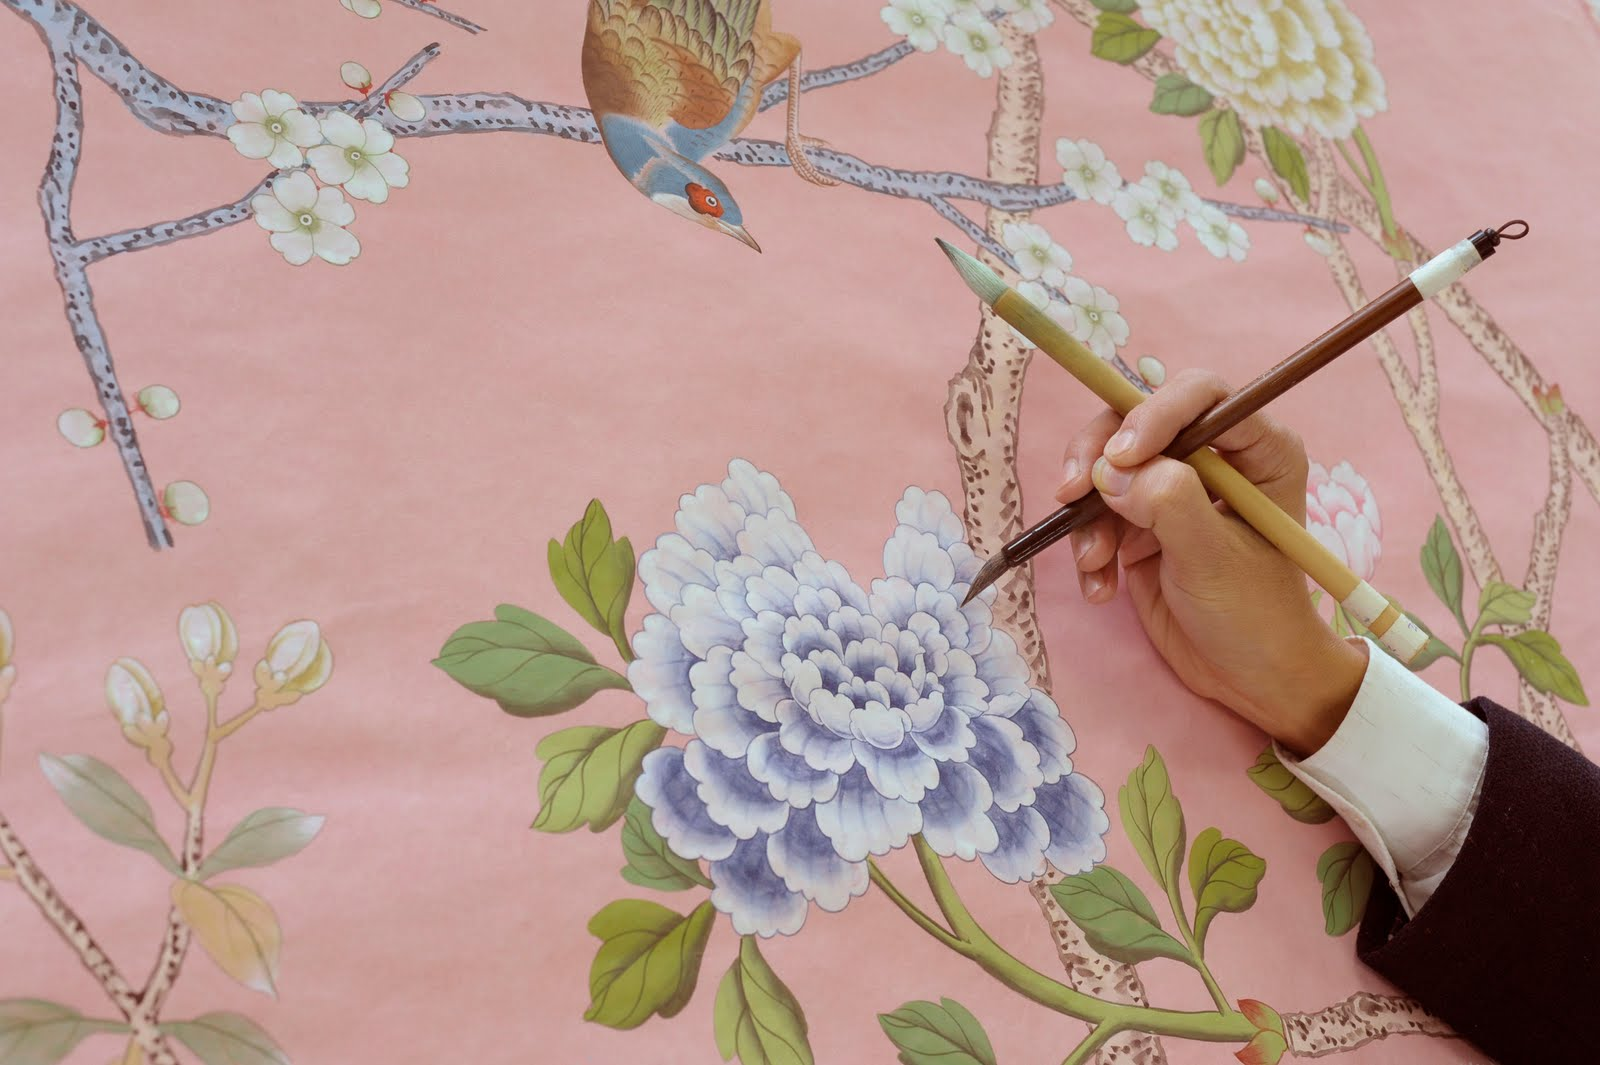 CHLOE VAN PARIS De Gournay Hand painted wallpaper 1600x1065